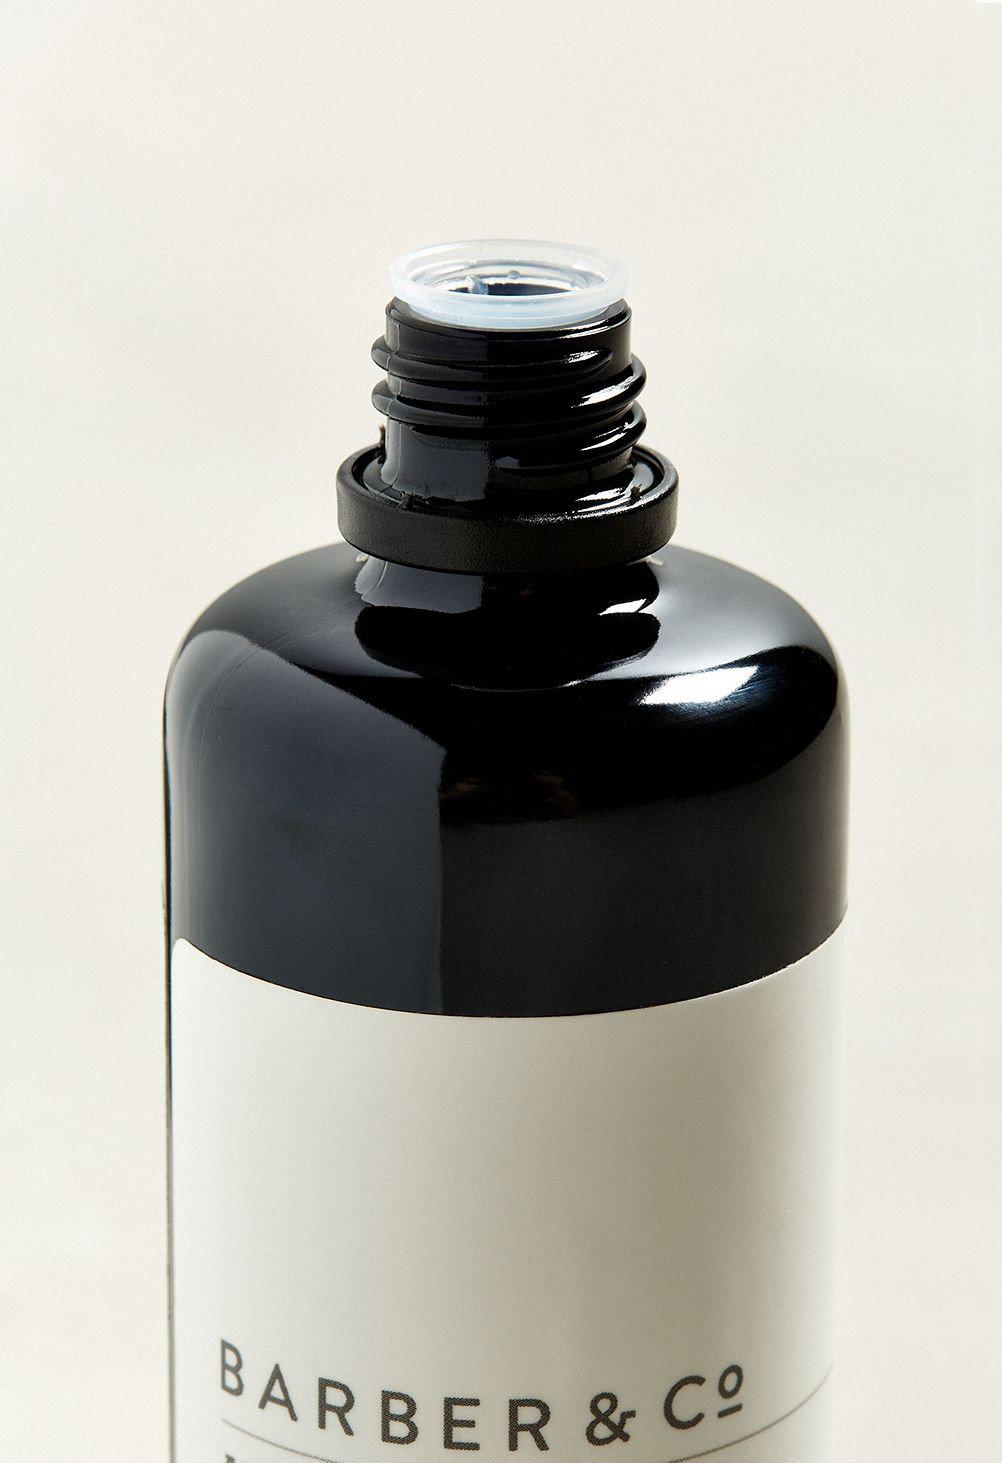 Health + Wellness Style + Design Travel Shop tableware shaker bottle indoor glass bottle liquid product product design